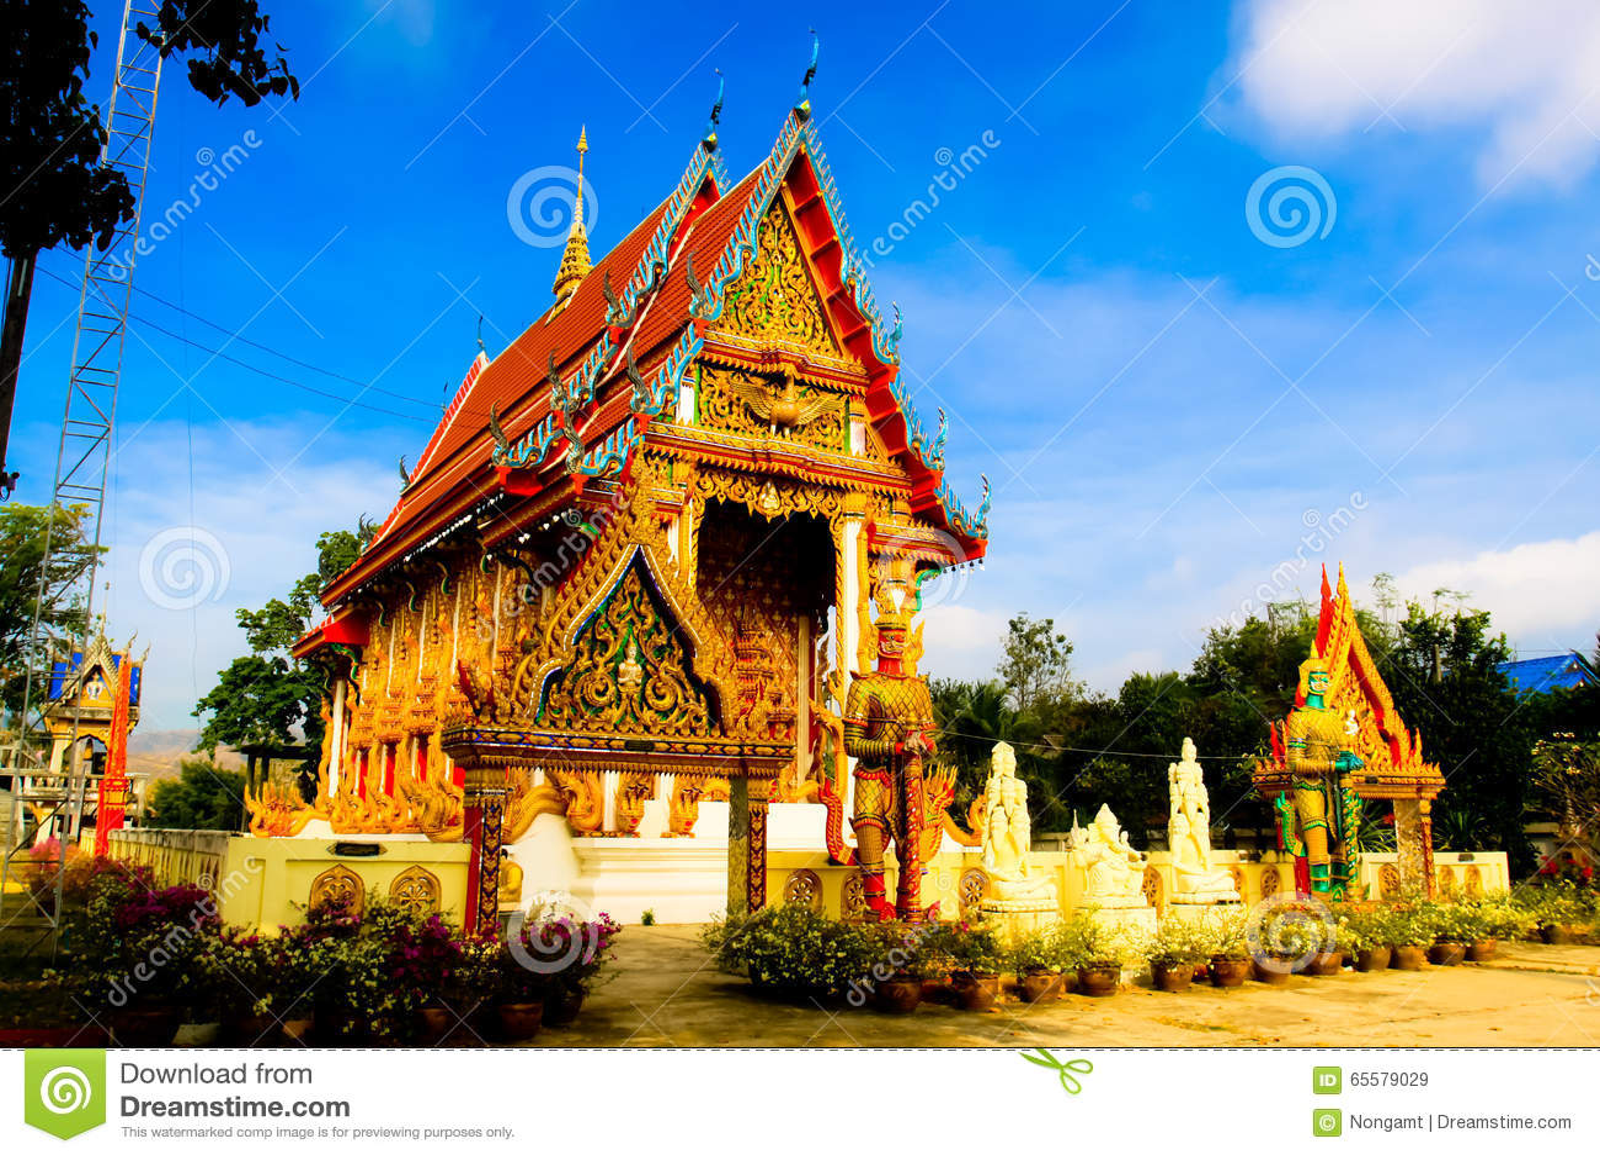 Arquitetura tailandesa do templo